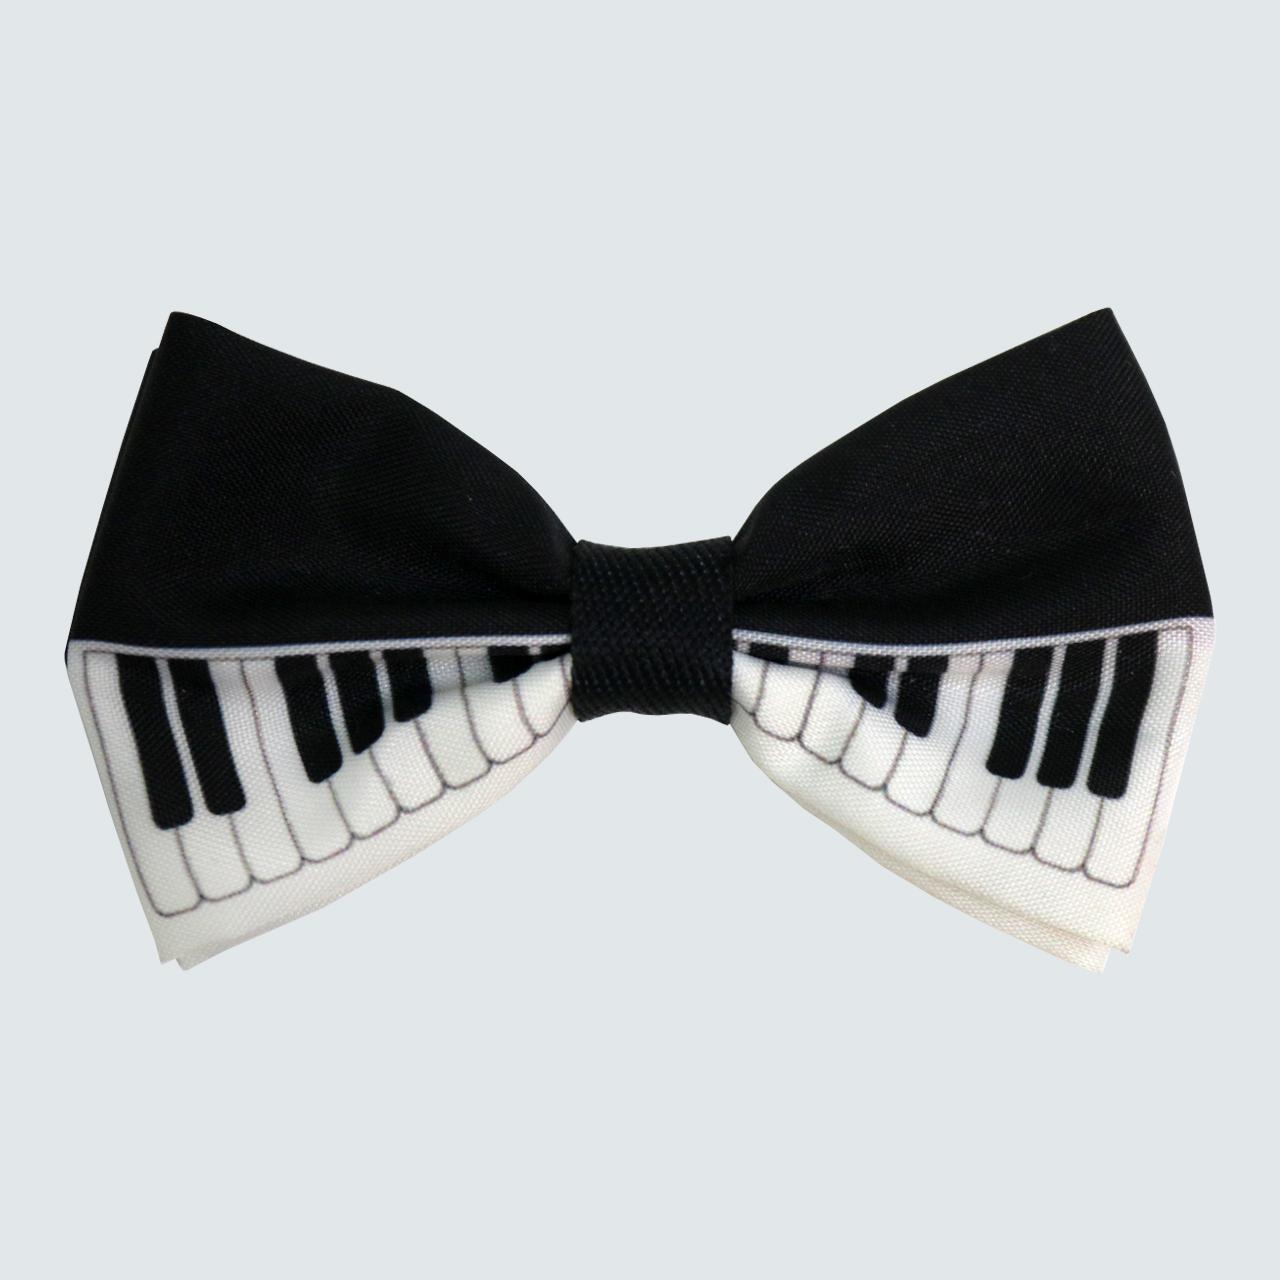 پاپیون مدل پیانو کد 115